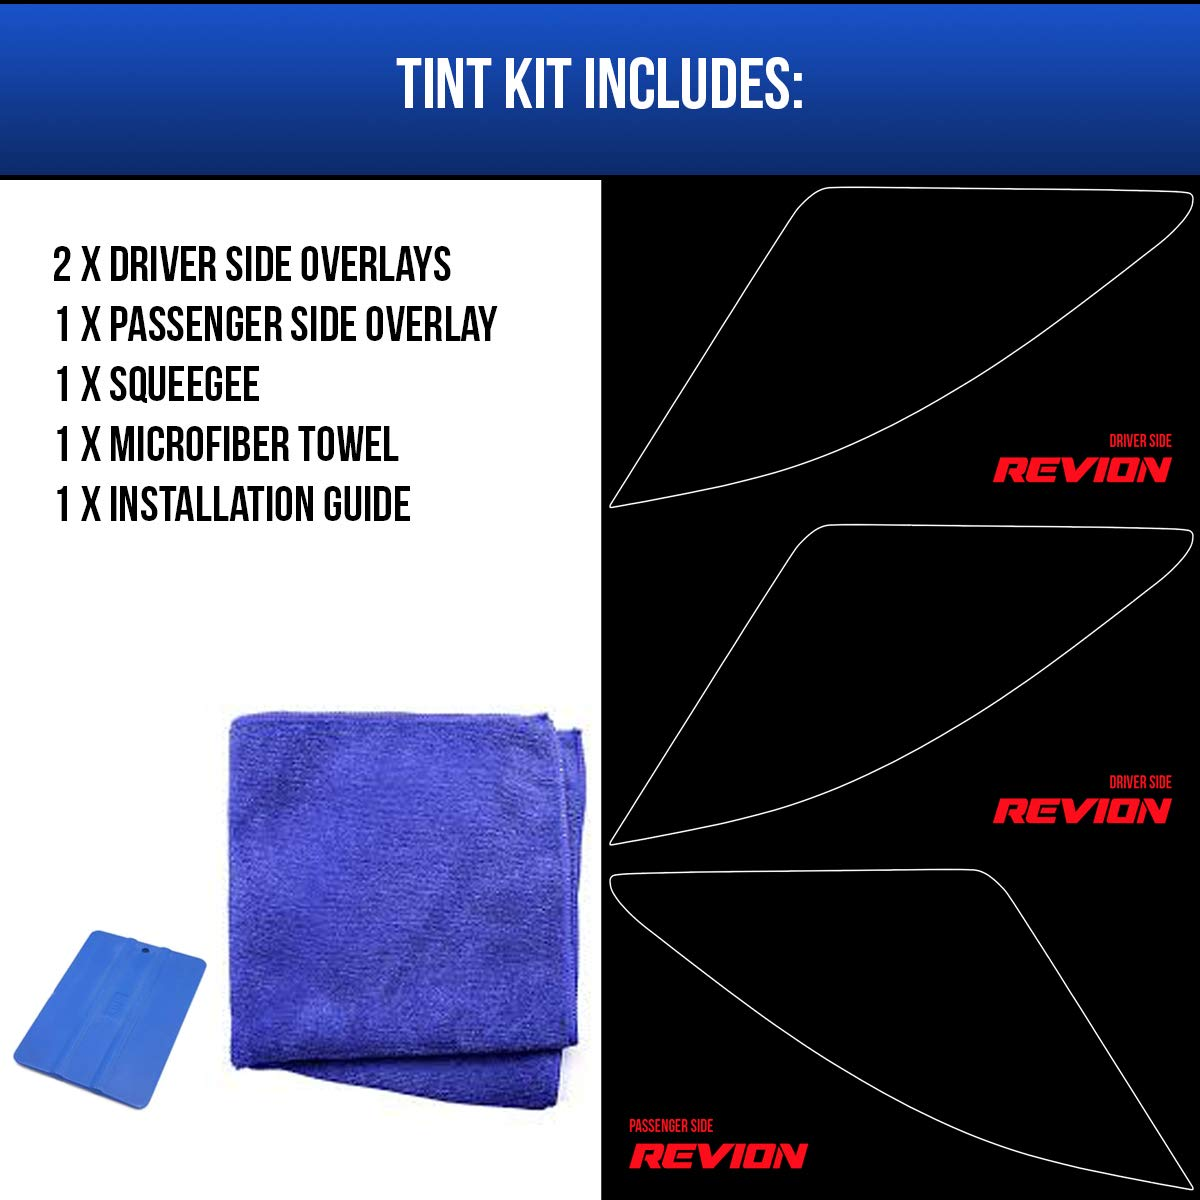 Glossy Black Smoke Vinyl Reflector Amber Delete Overlay Kit Headlight Tint compatible with 2015-2019 Subaru WRX//STI